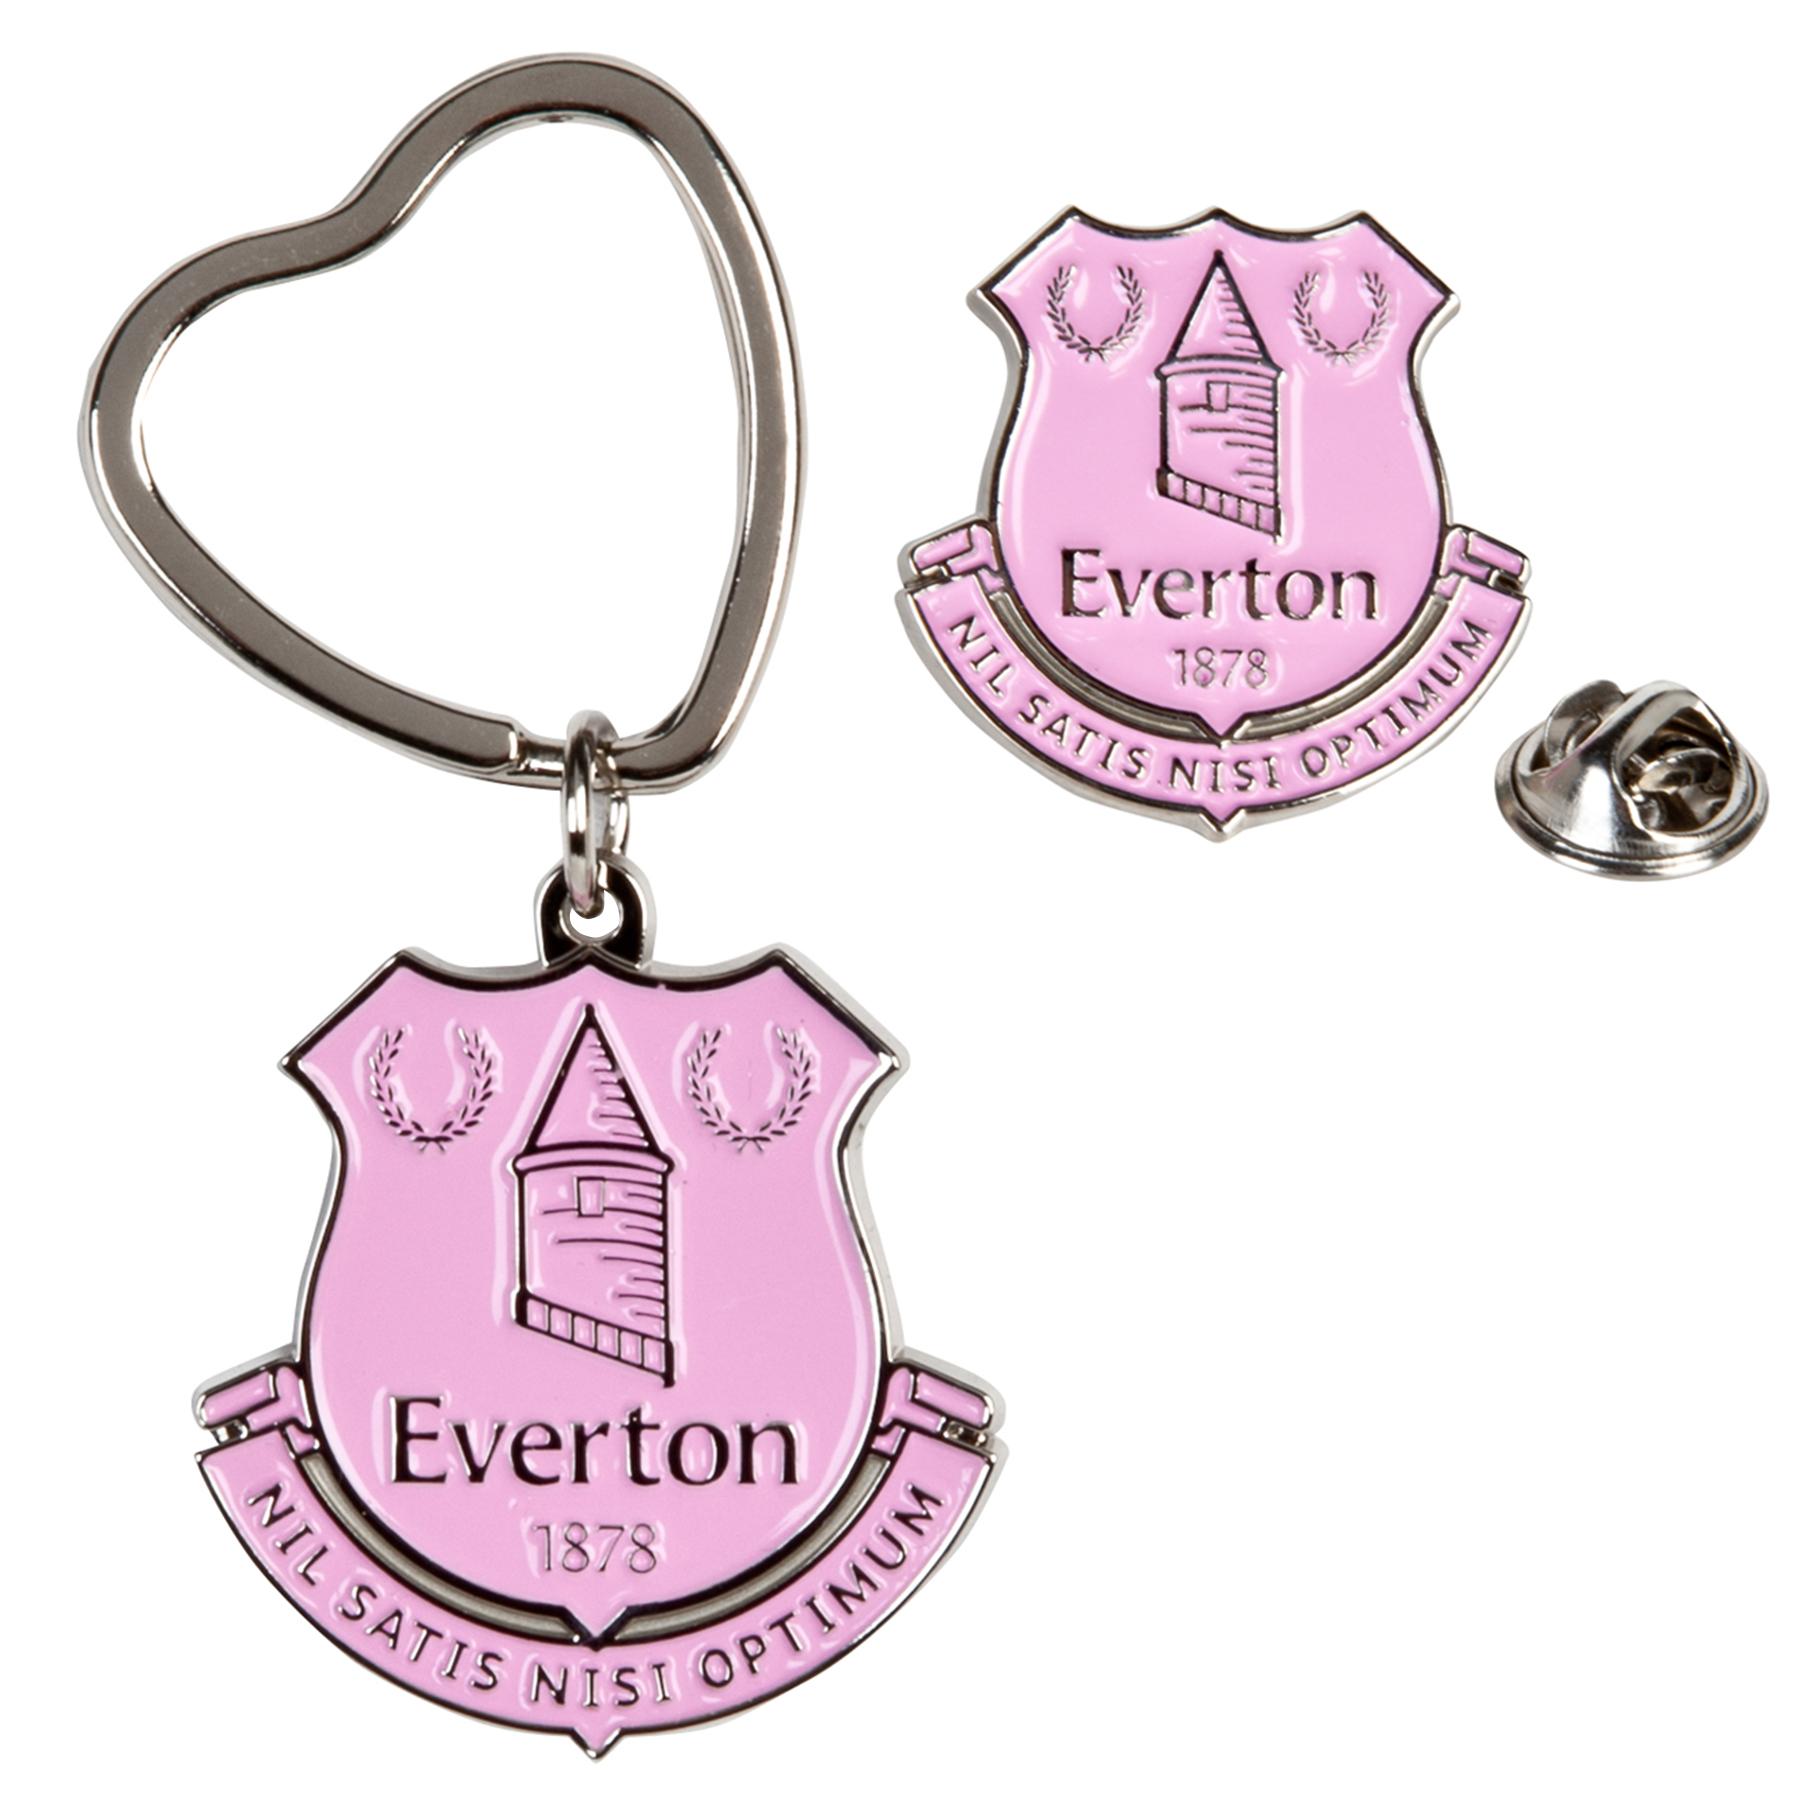 Everton Badge and Keyring Set - Pink